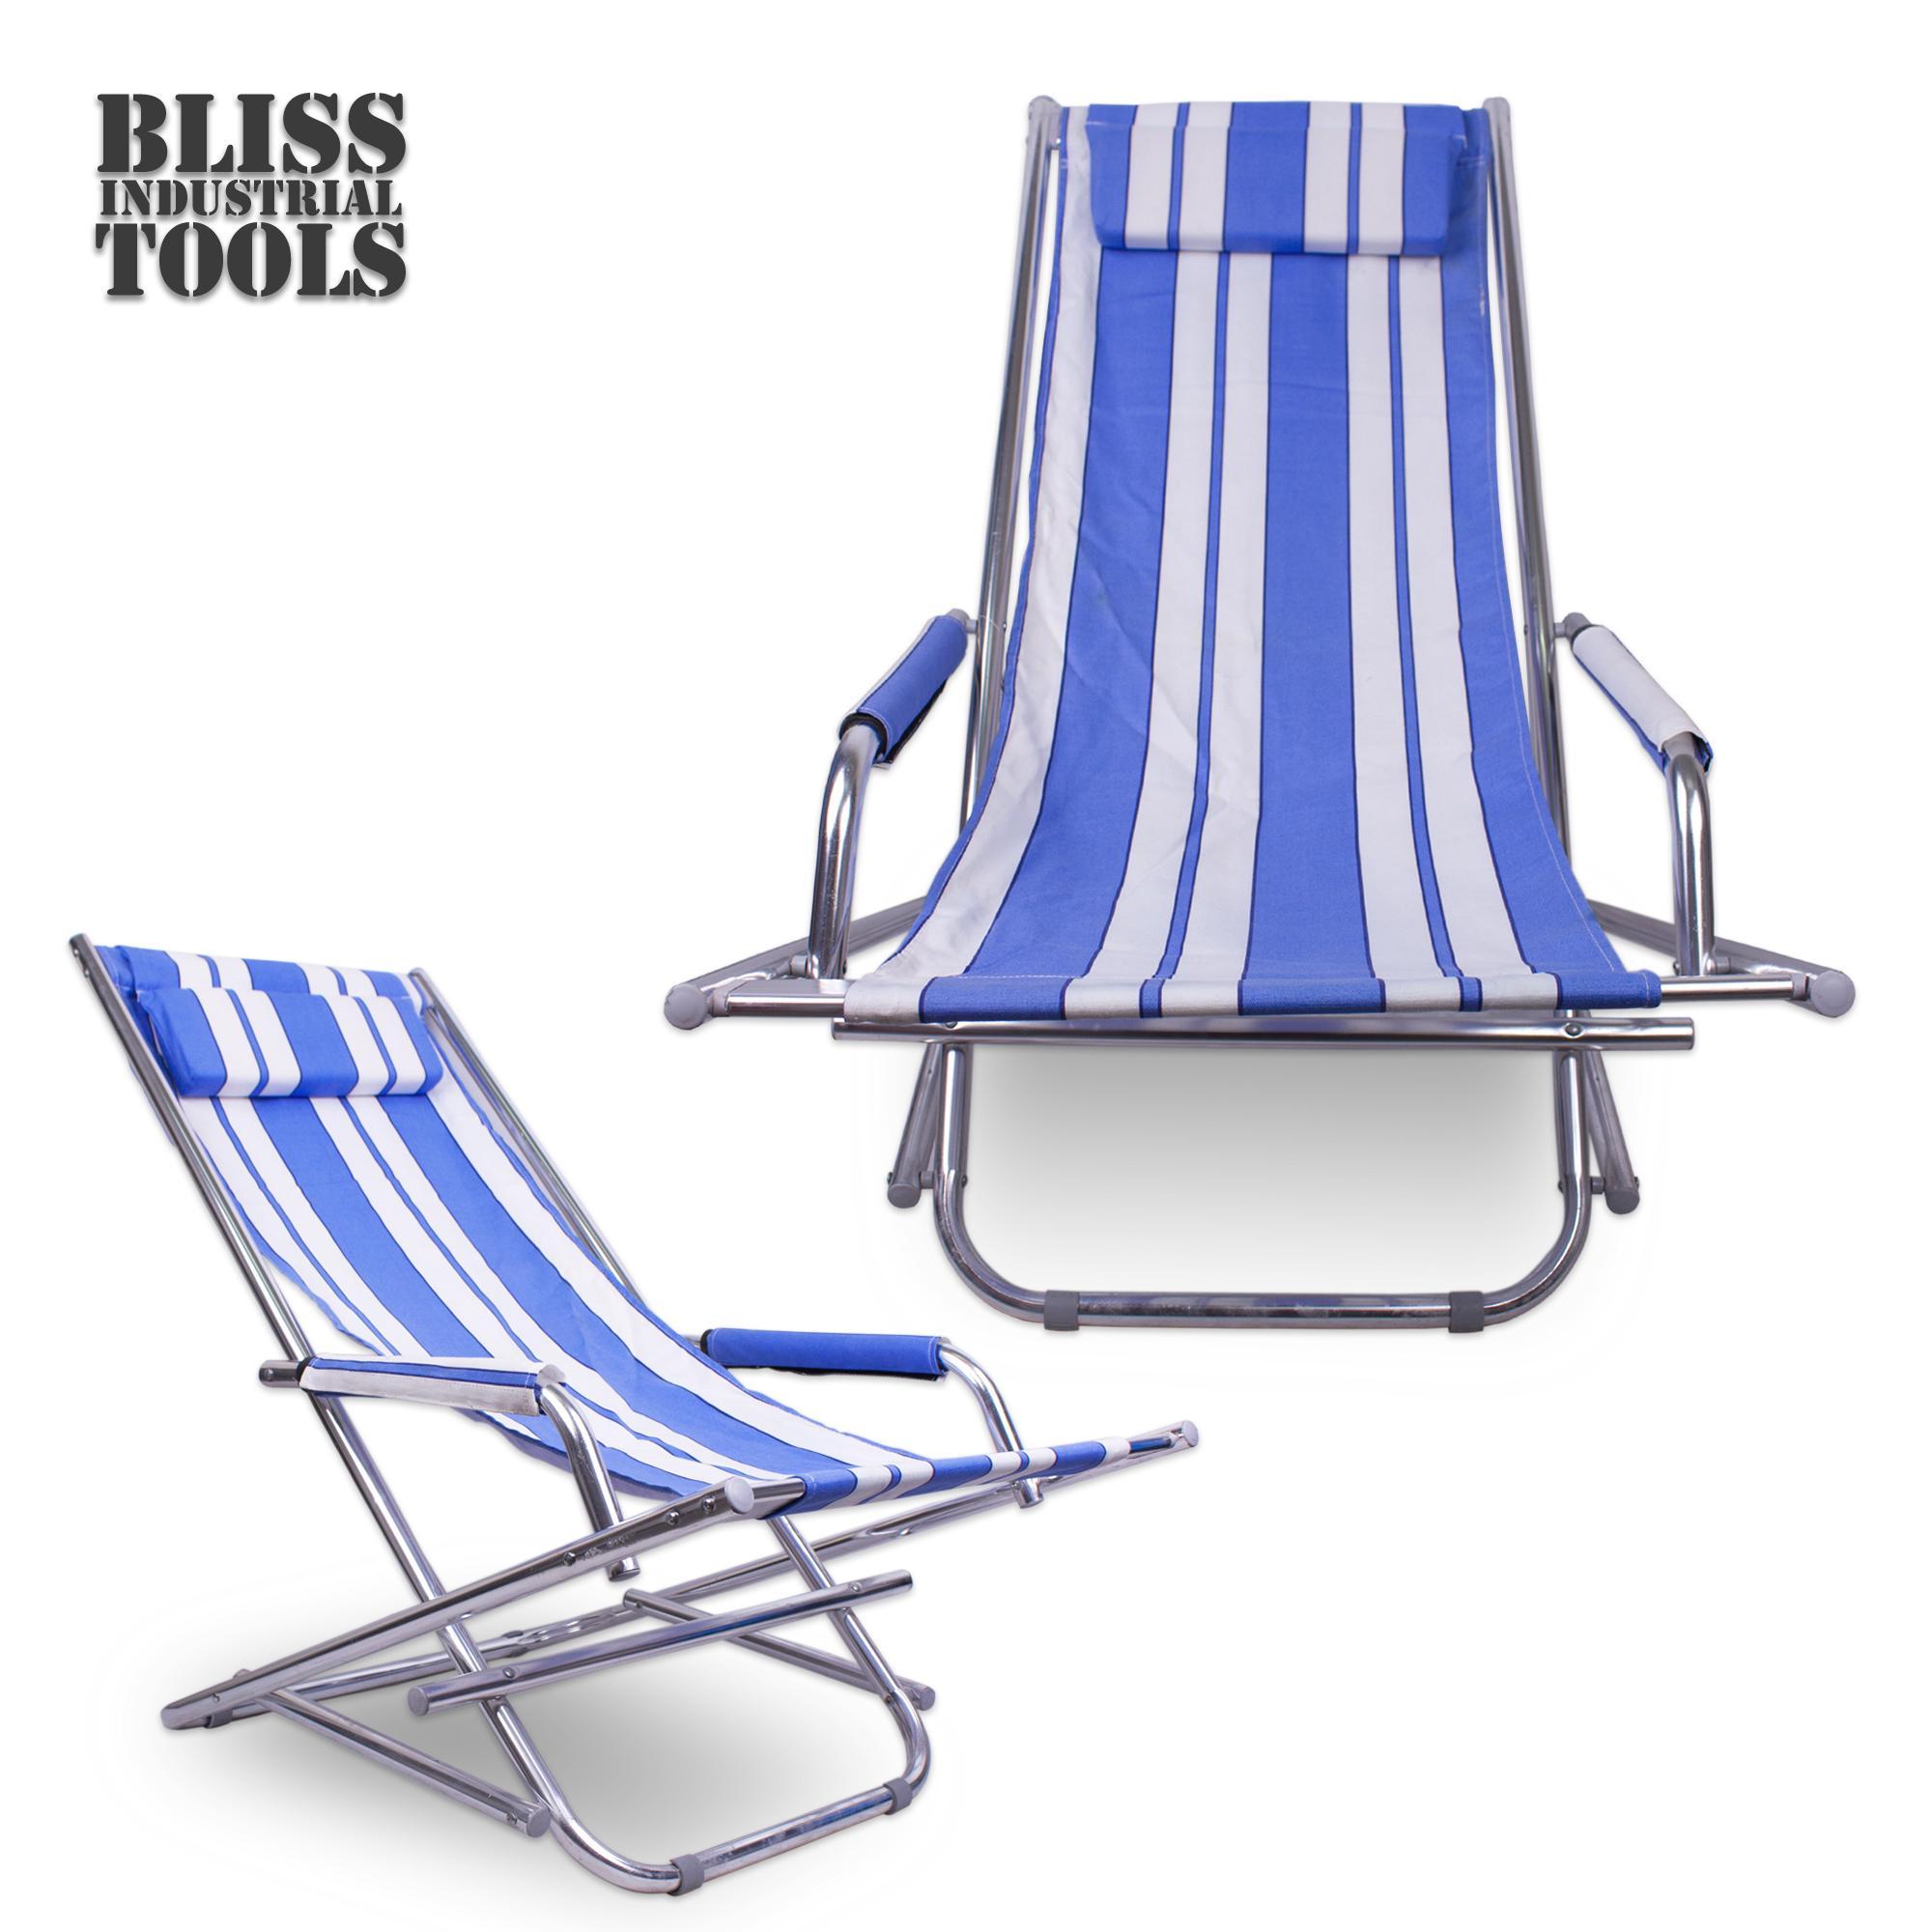 ca7946f1588 B.I.T. ASC-008 Foldable Portable Lightweight Beach Chair Sling Swinging  Chair (Blue)